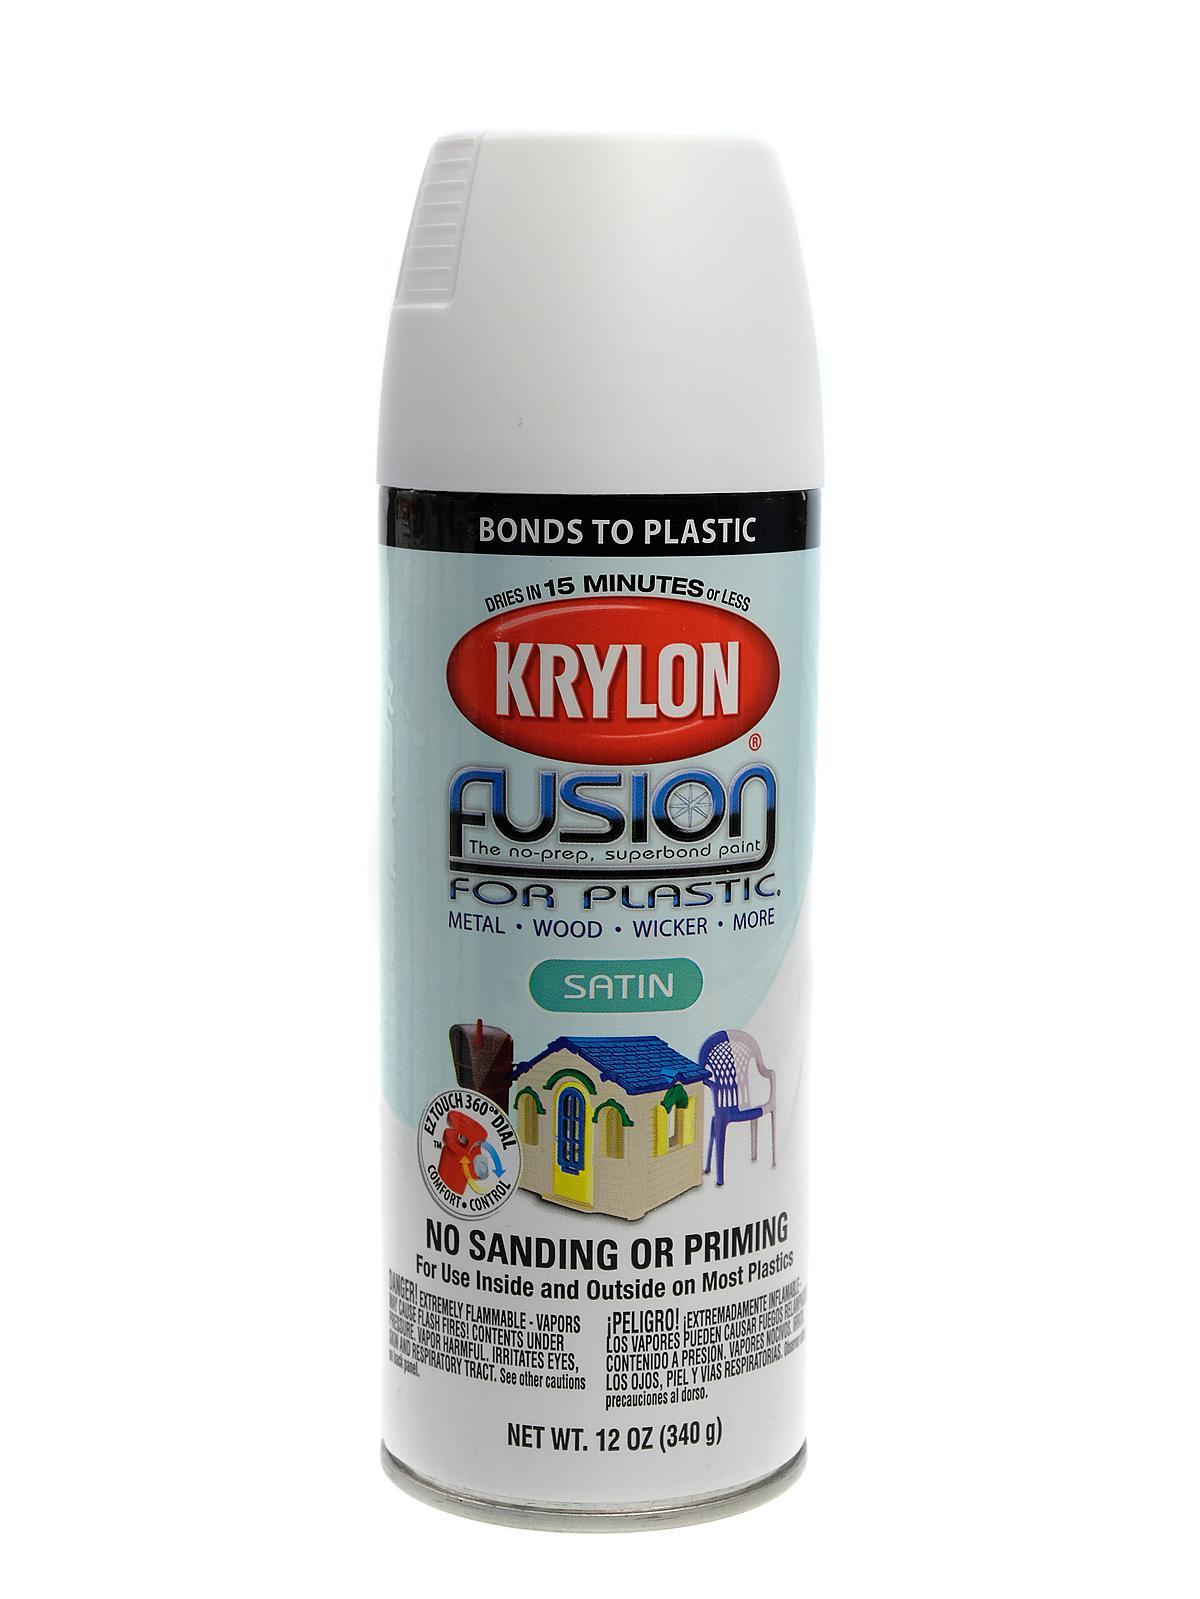 Krylon Fusion Spray Paint For Plastic